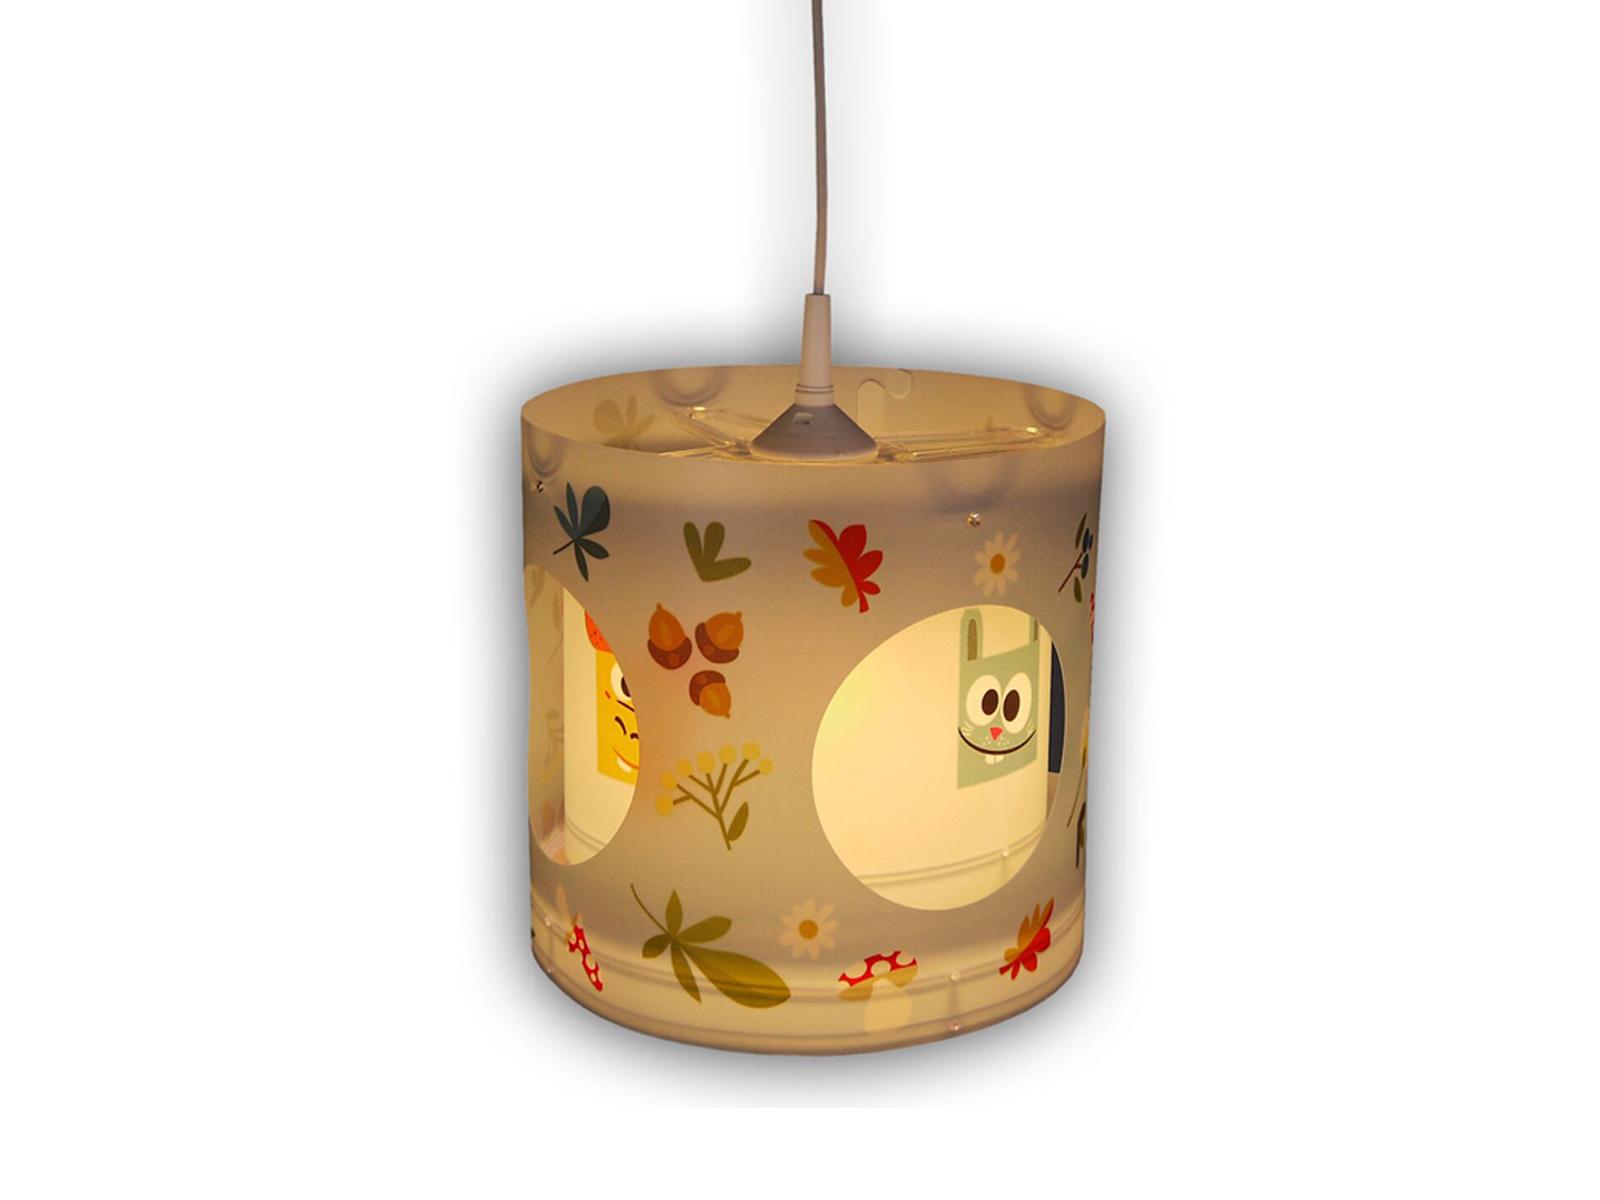 Beleuchtung Fur Kinderzimmer Lampenschirm Drehend Led Licht Kinder